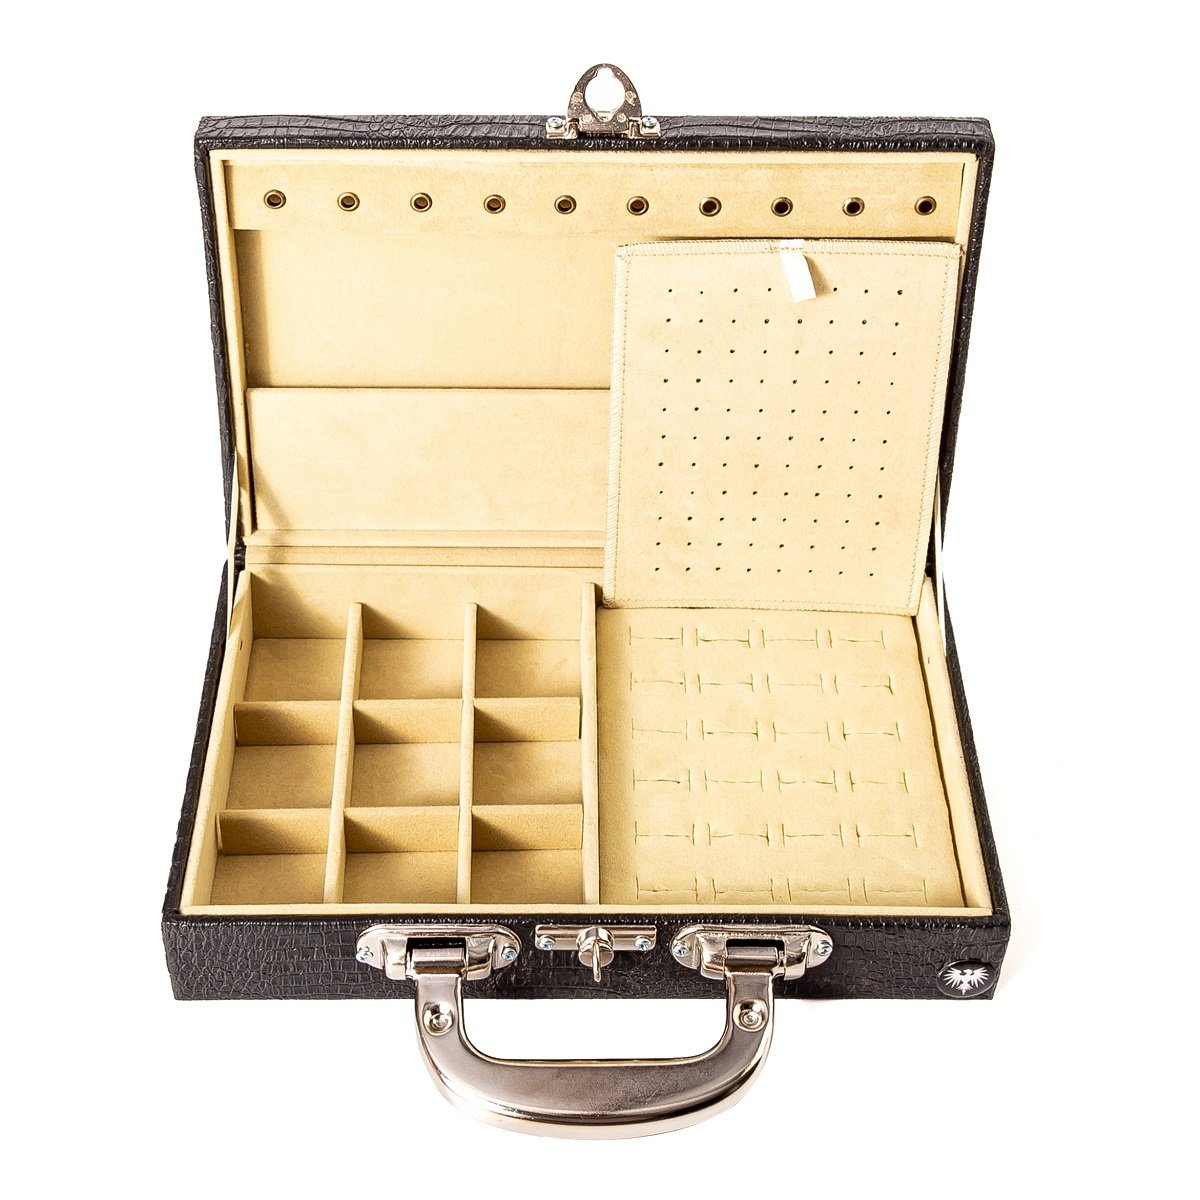 maleta-porta-joias-couro-ecologico-pequeno-preto-bege-imagem-1.jpg